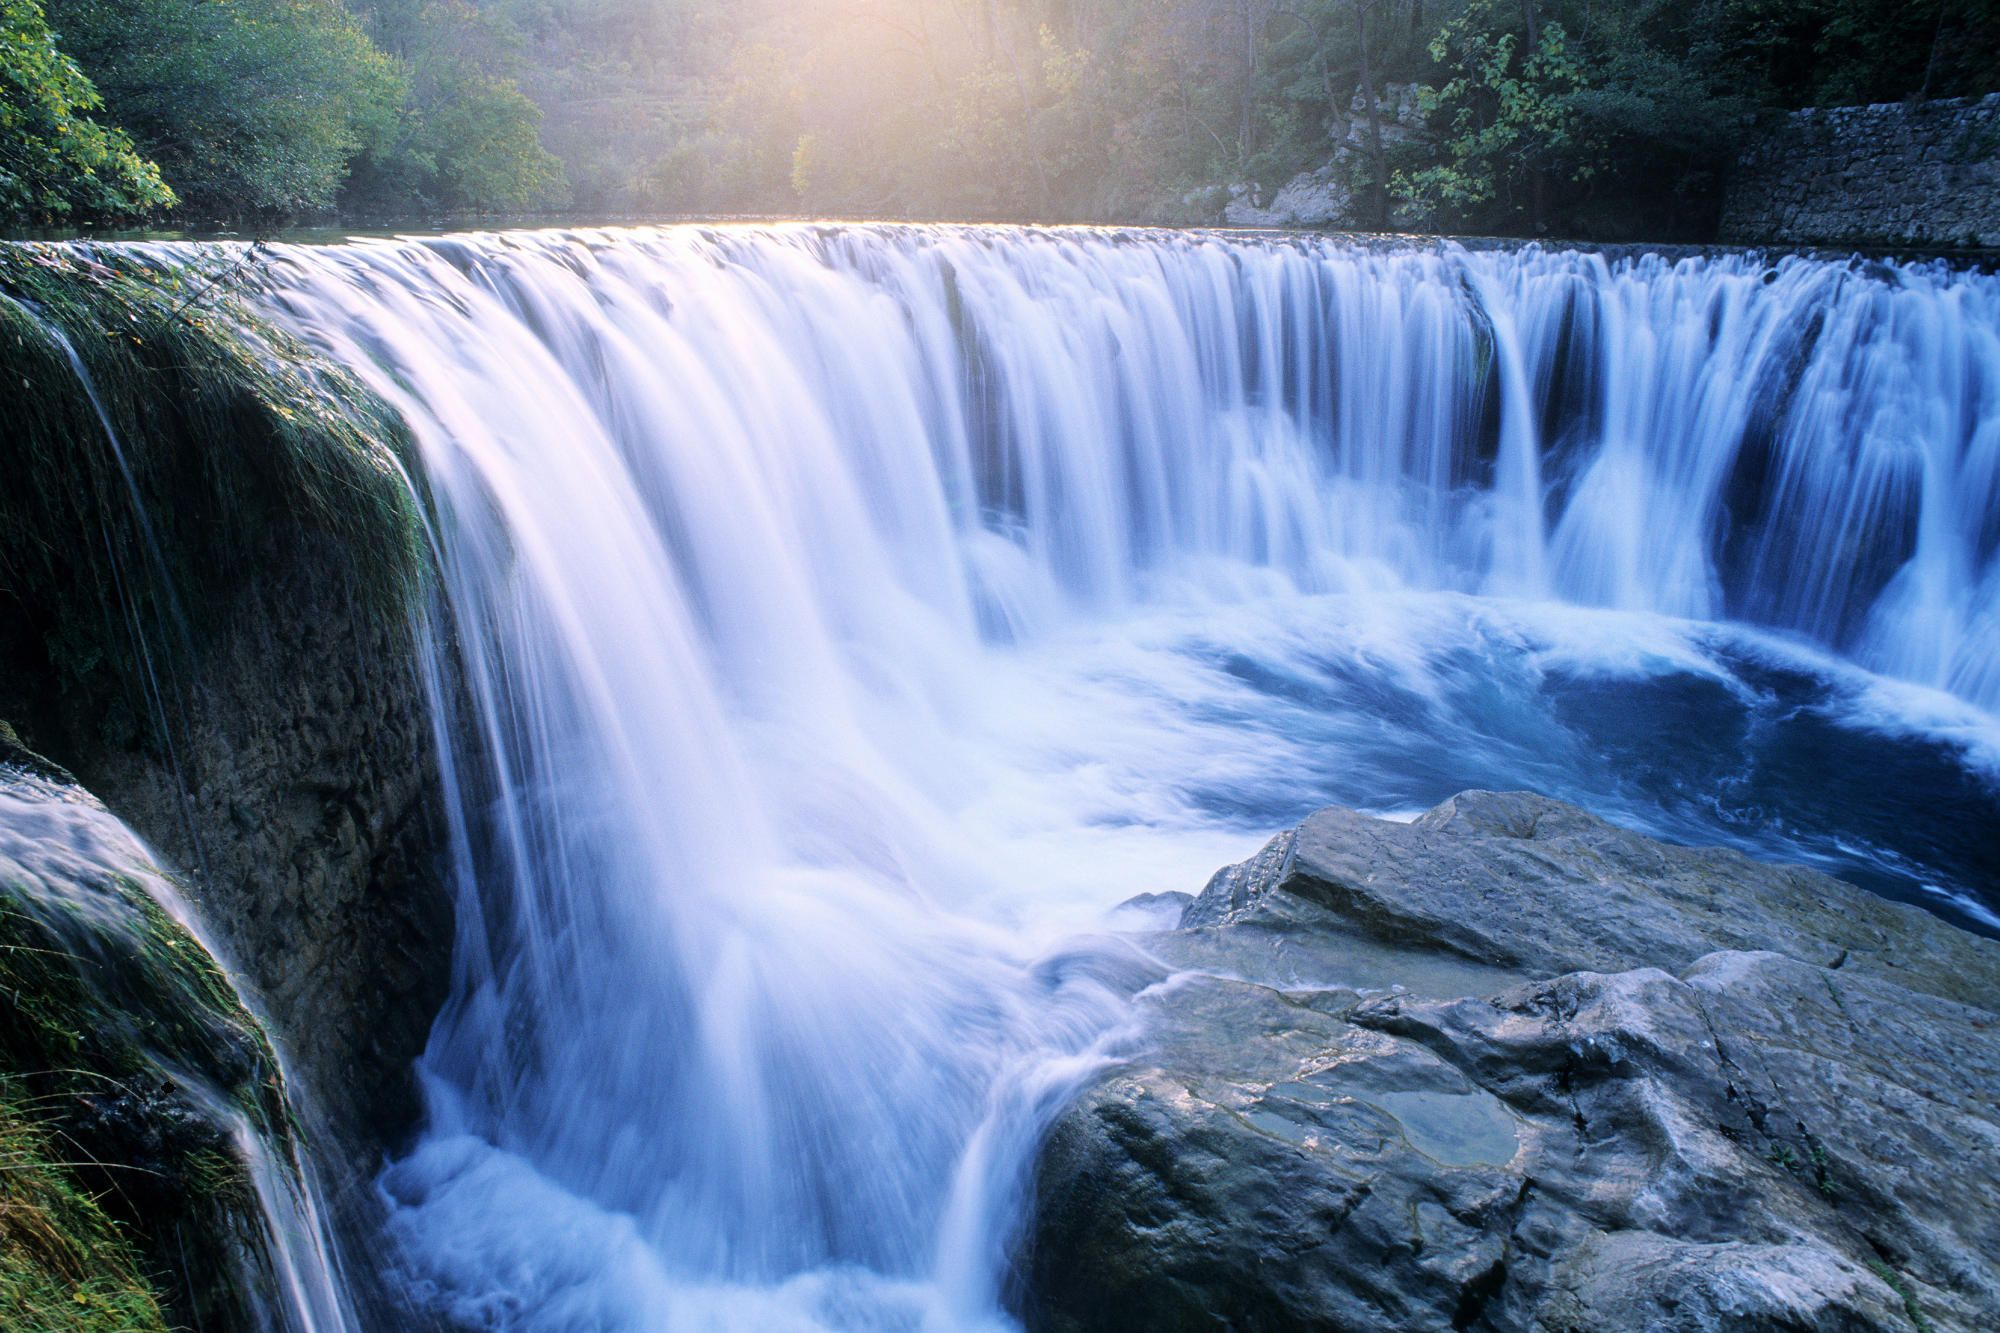 Latest Wallpapers Of Waterfalls For Desktop By Birdsnanimals Waterfall Wallpaper Nature Desktop Waterfall